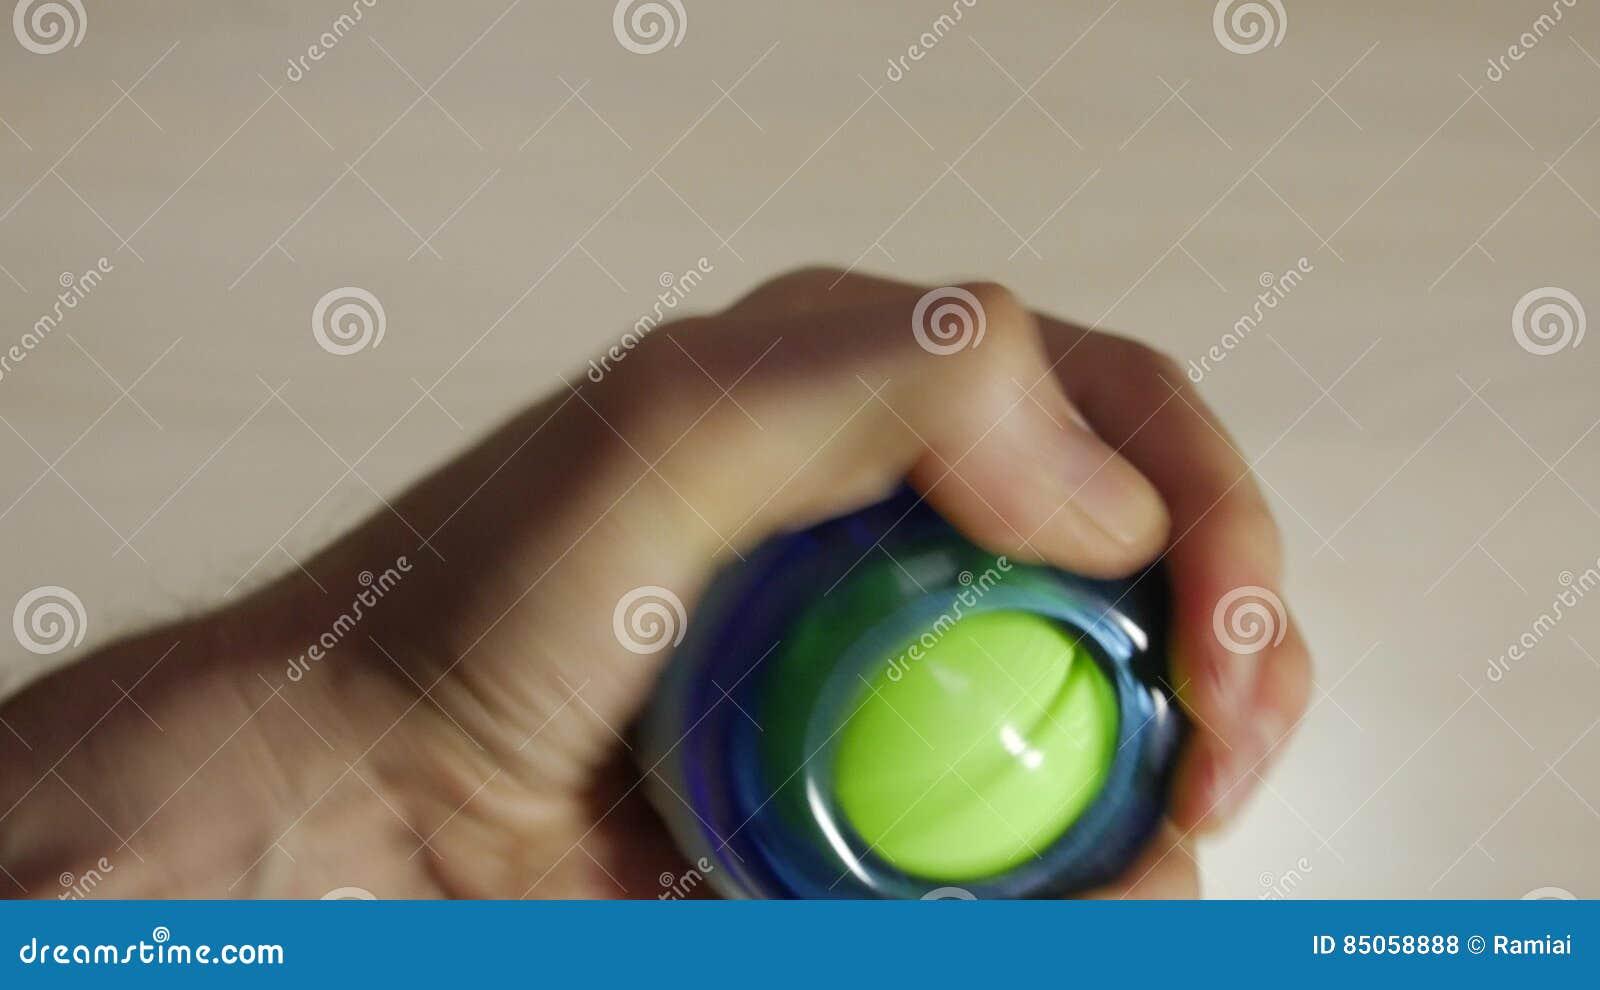 Mann Dreht Den Handgelenkball, Verstärkt Muskeln In Der Hand, Finger ...